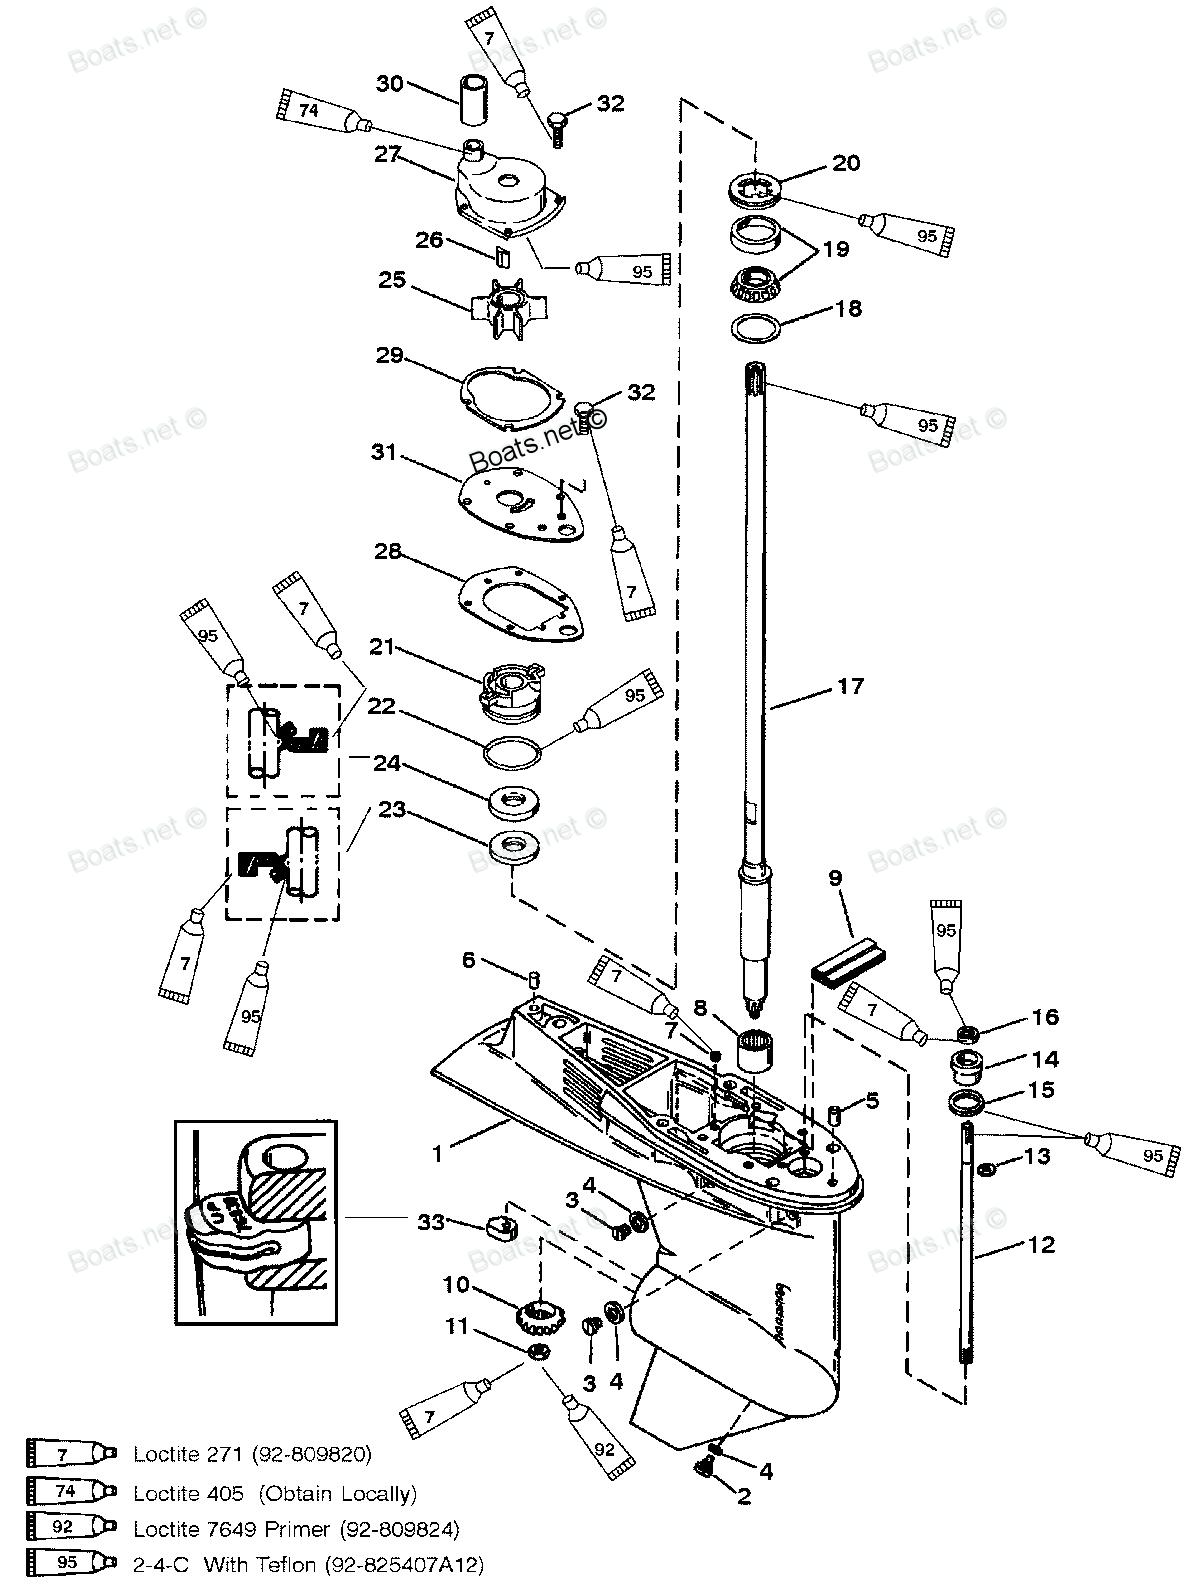 замена сальников редуктора лодочный мотор 9.9 ямаха